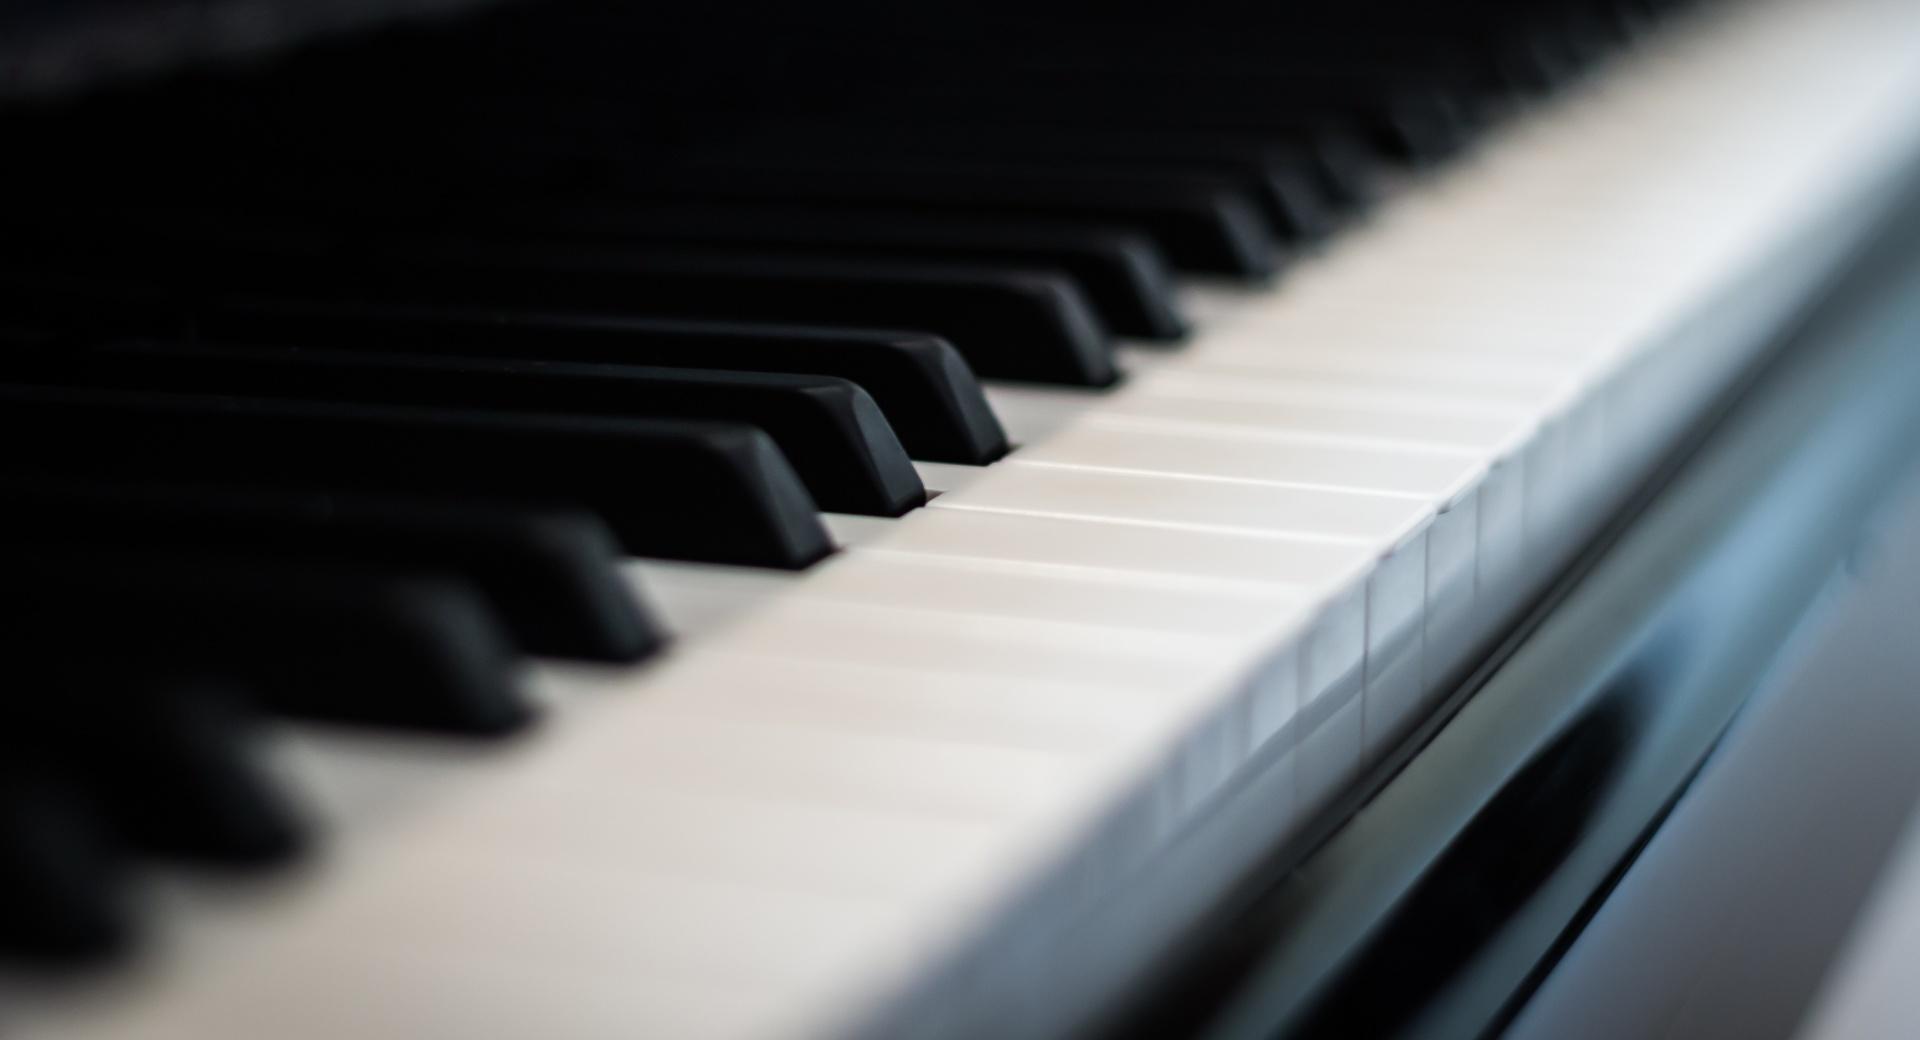 Piano Keys wallpapers HD quality